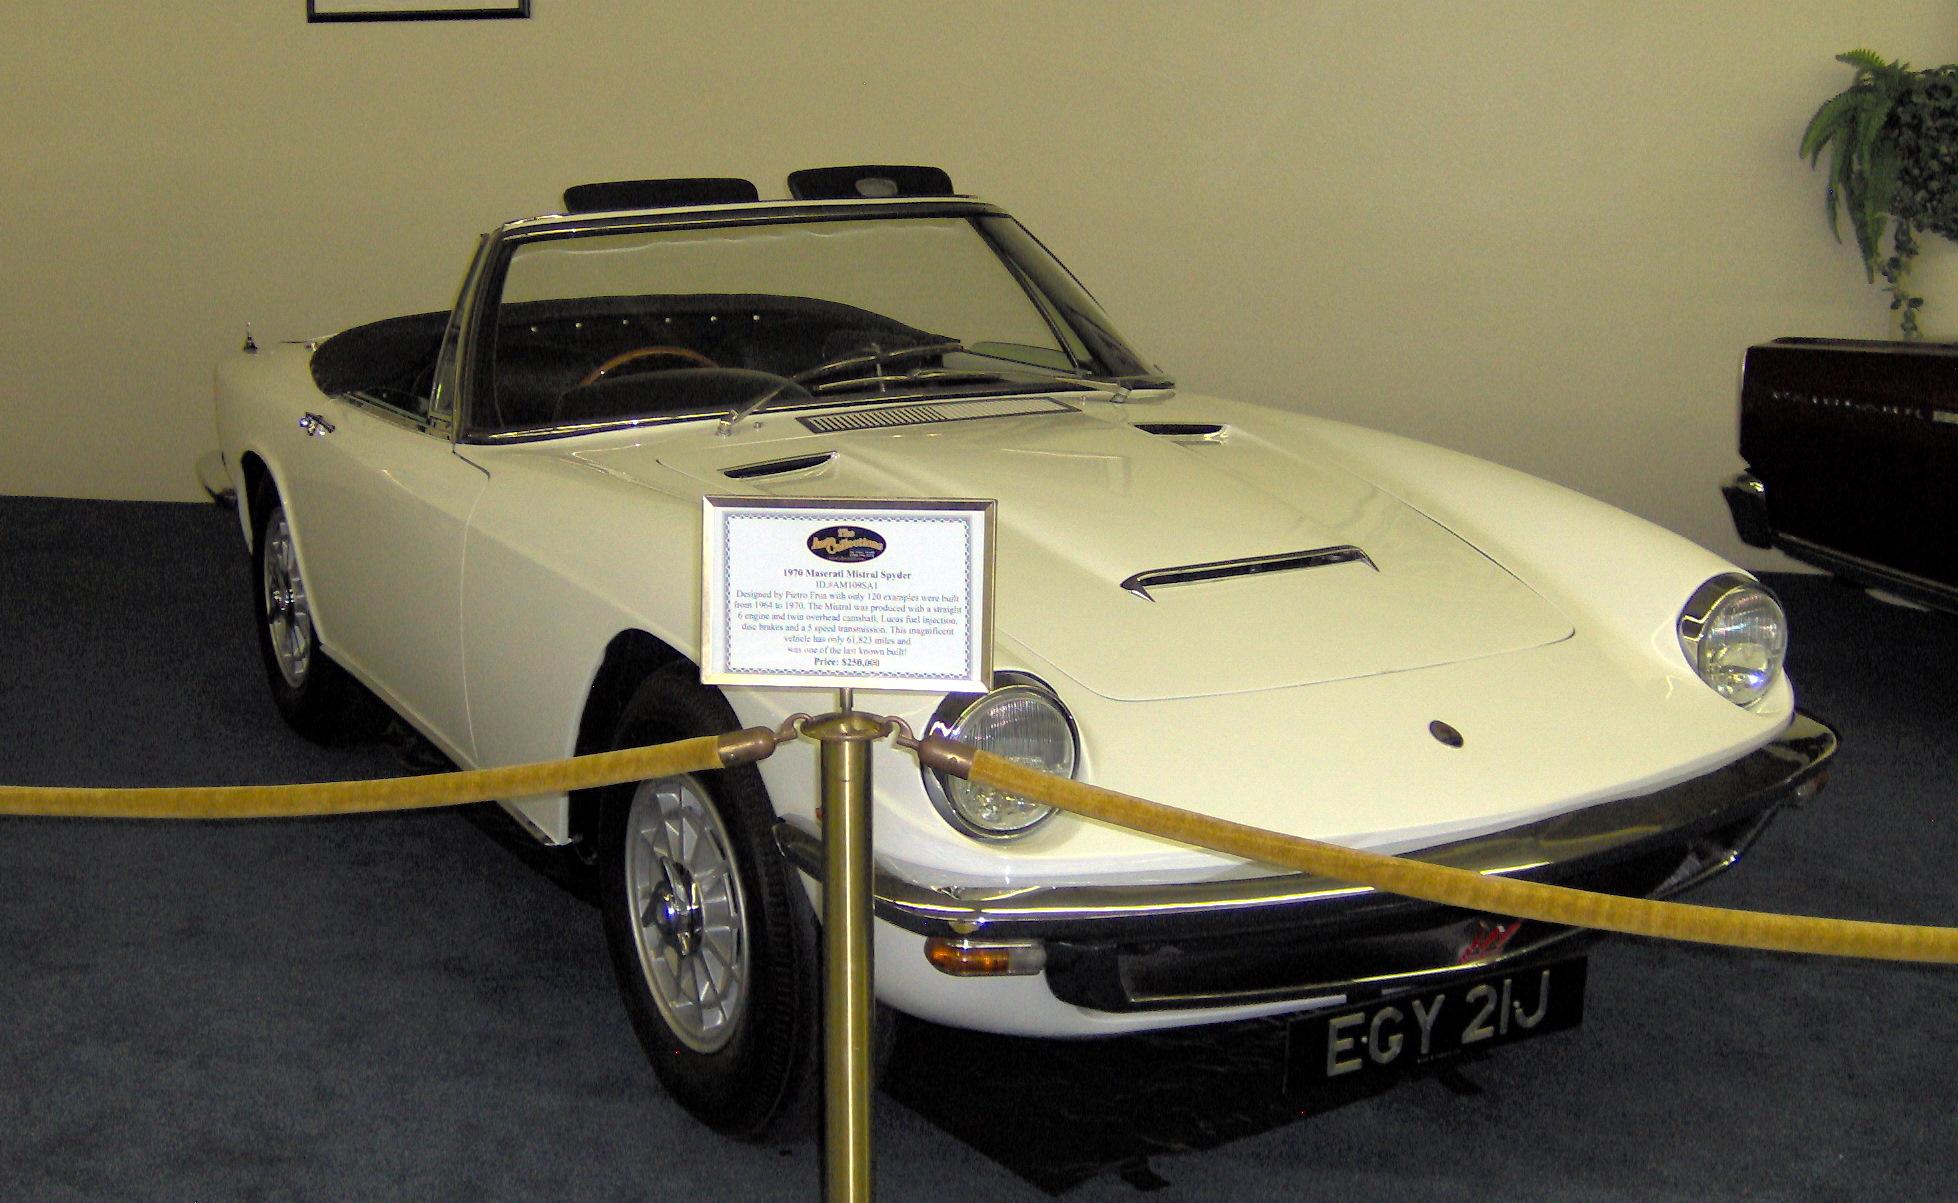 File:1970 Maserati Mistral Spyder.JPG - Wikimedia Commons